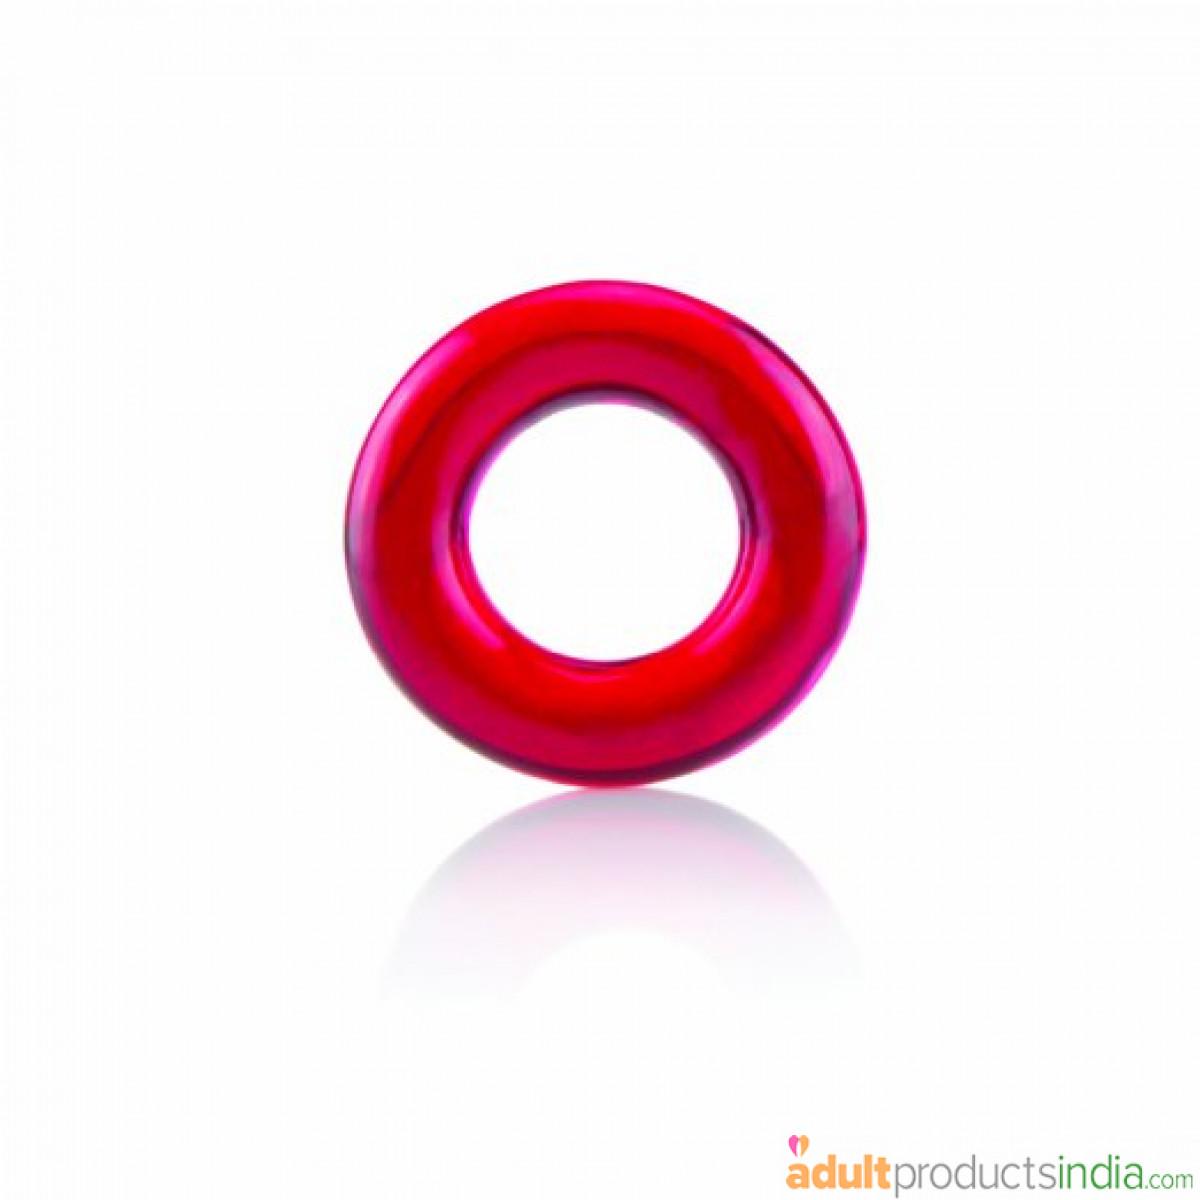 Screaming O - Ring O's Cock Ring